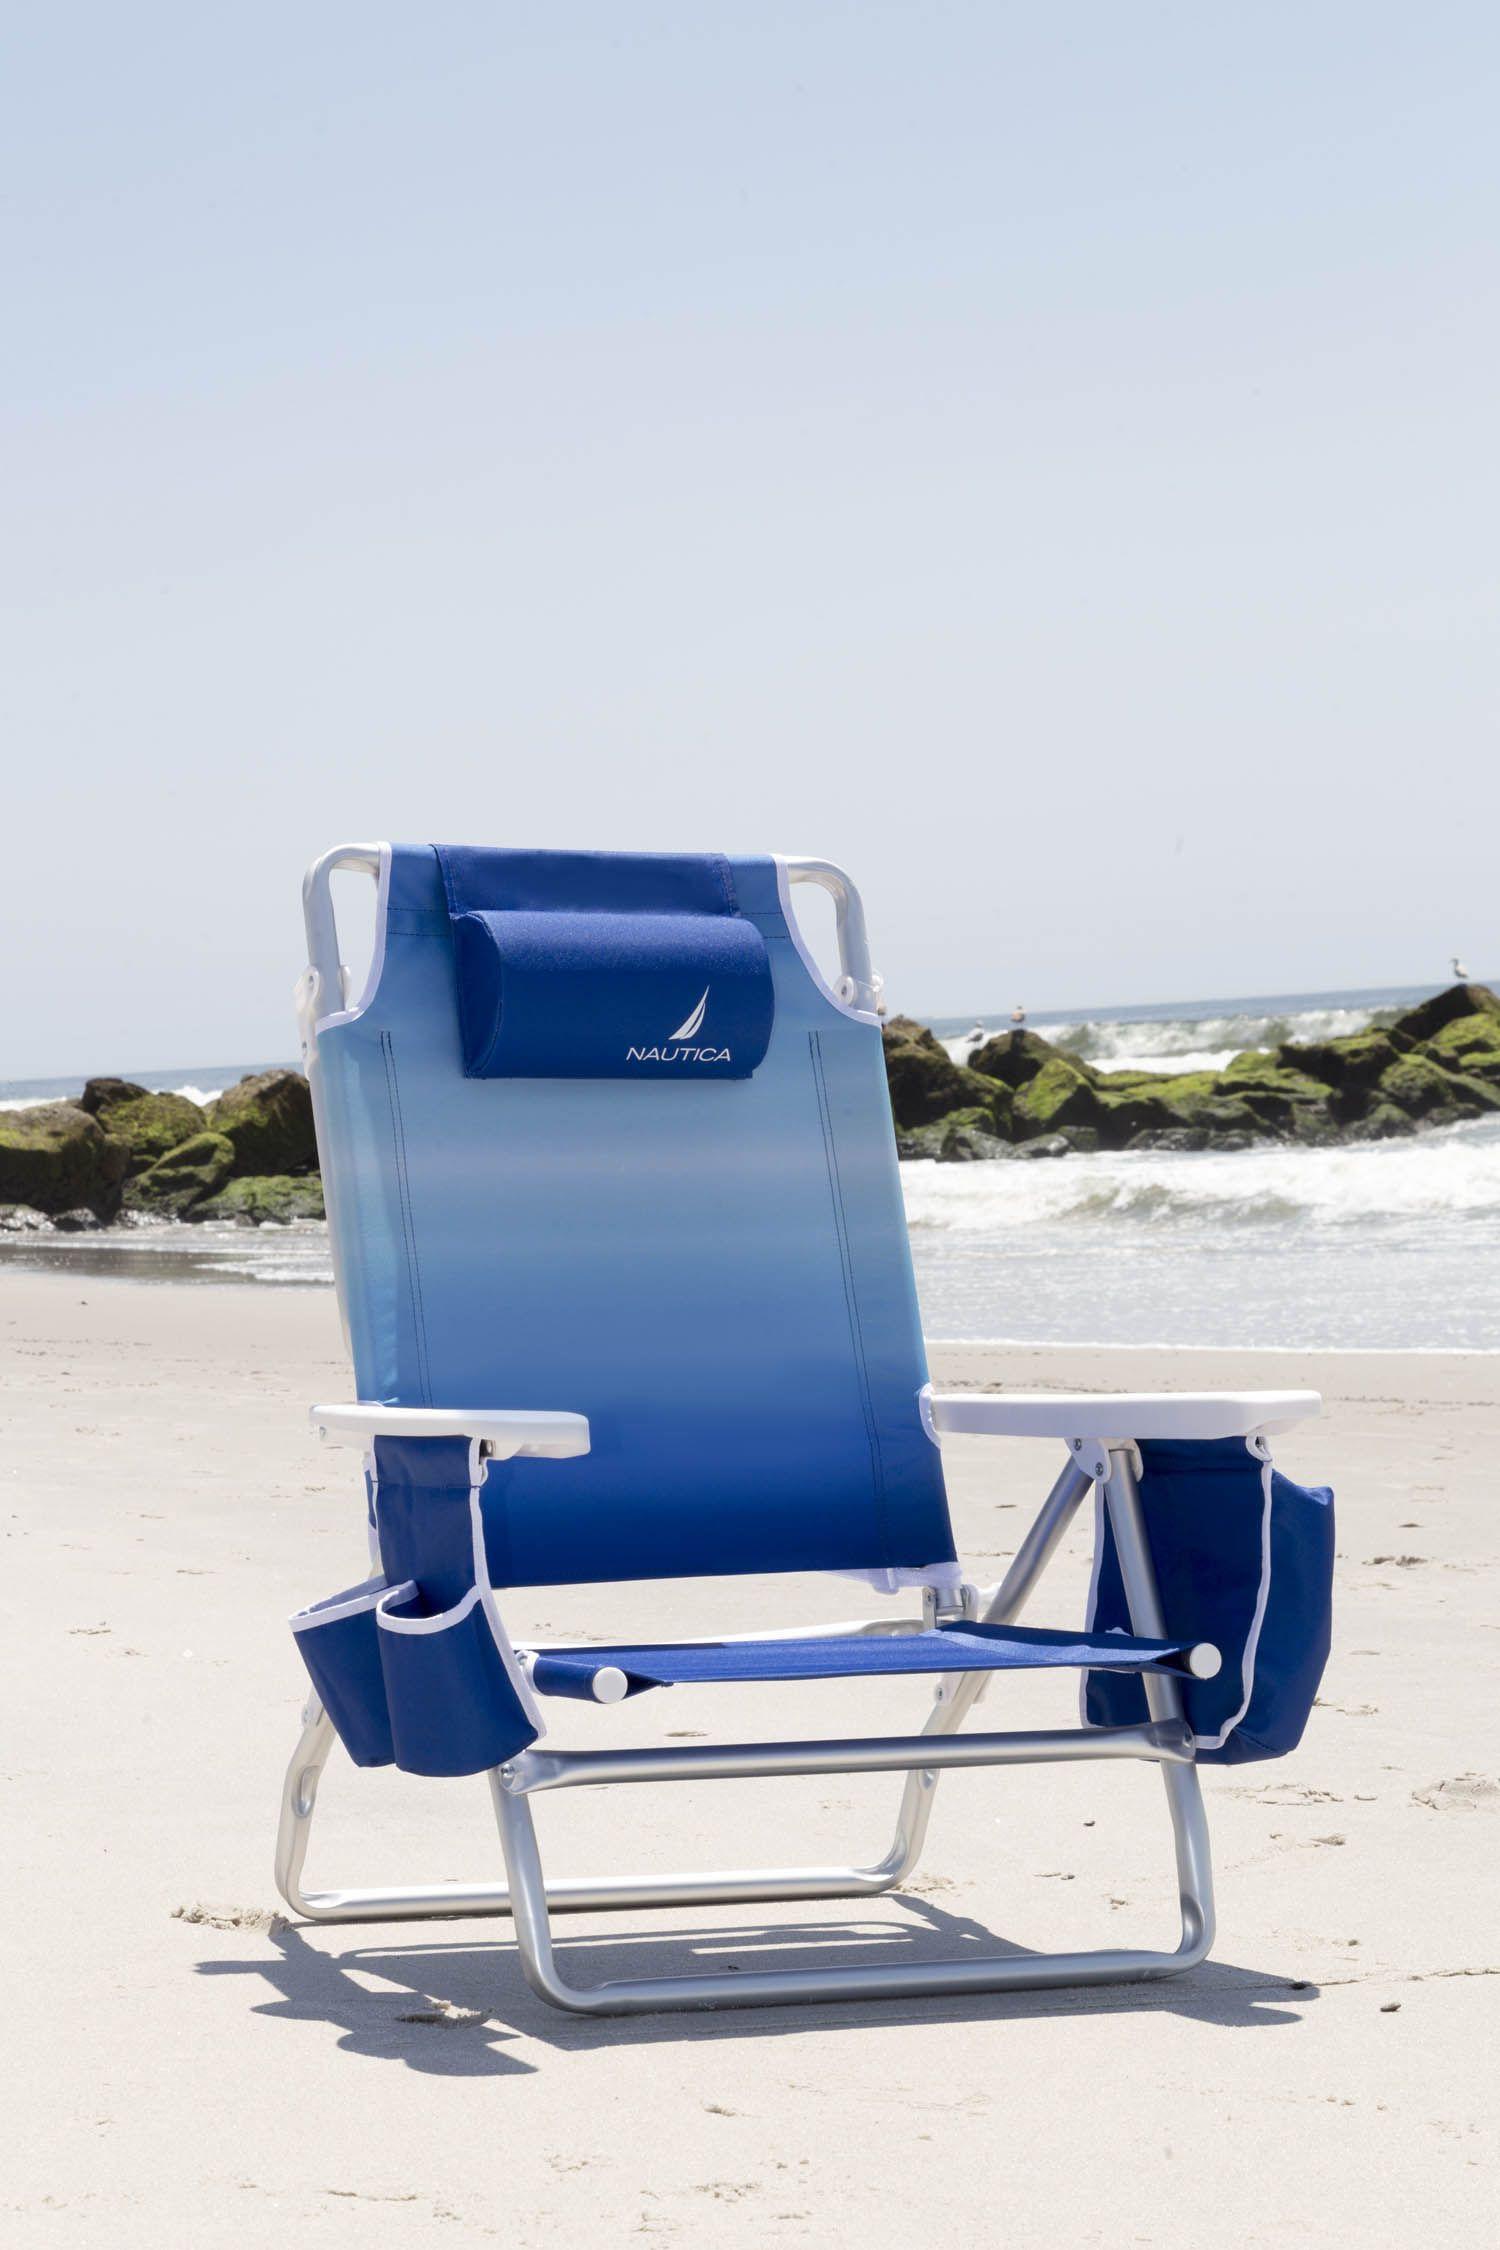 My new Nautica Beach Chair from Sam's Club. Discount